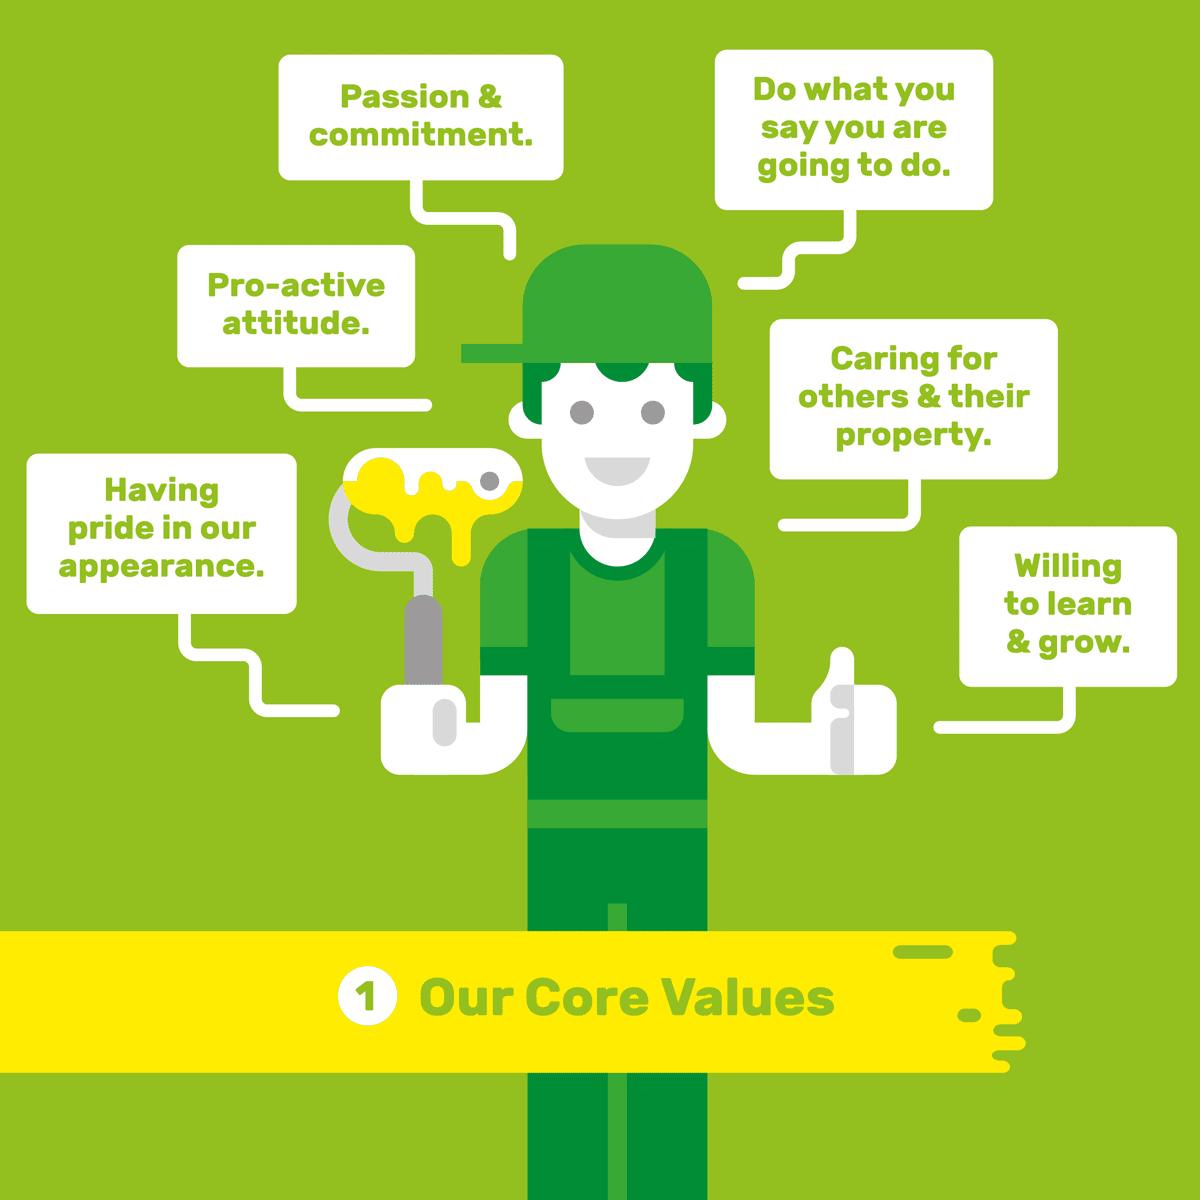 Carus Group's core values